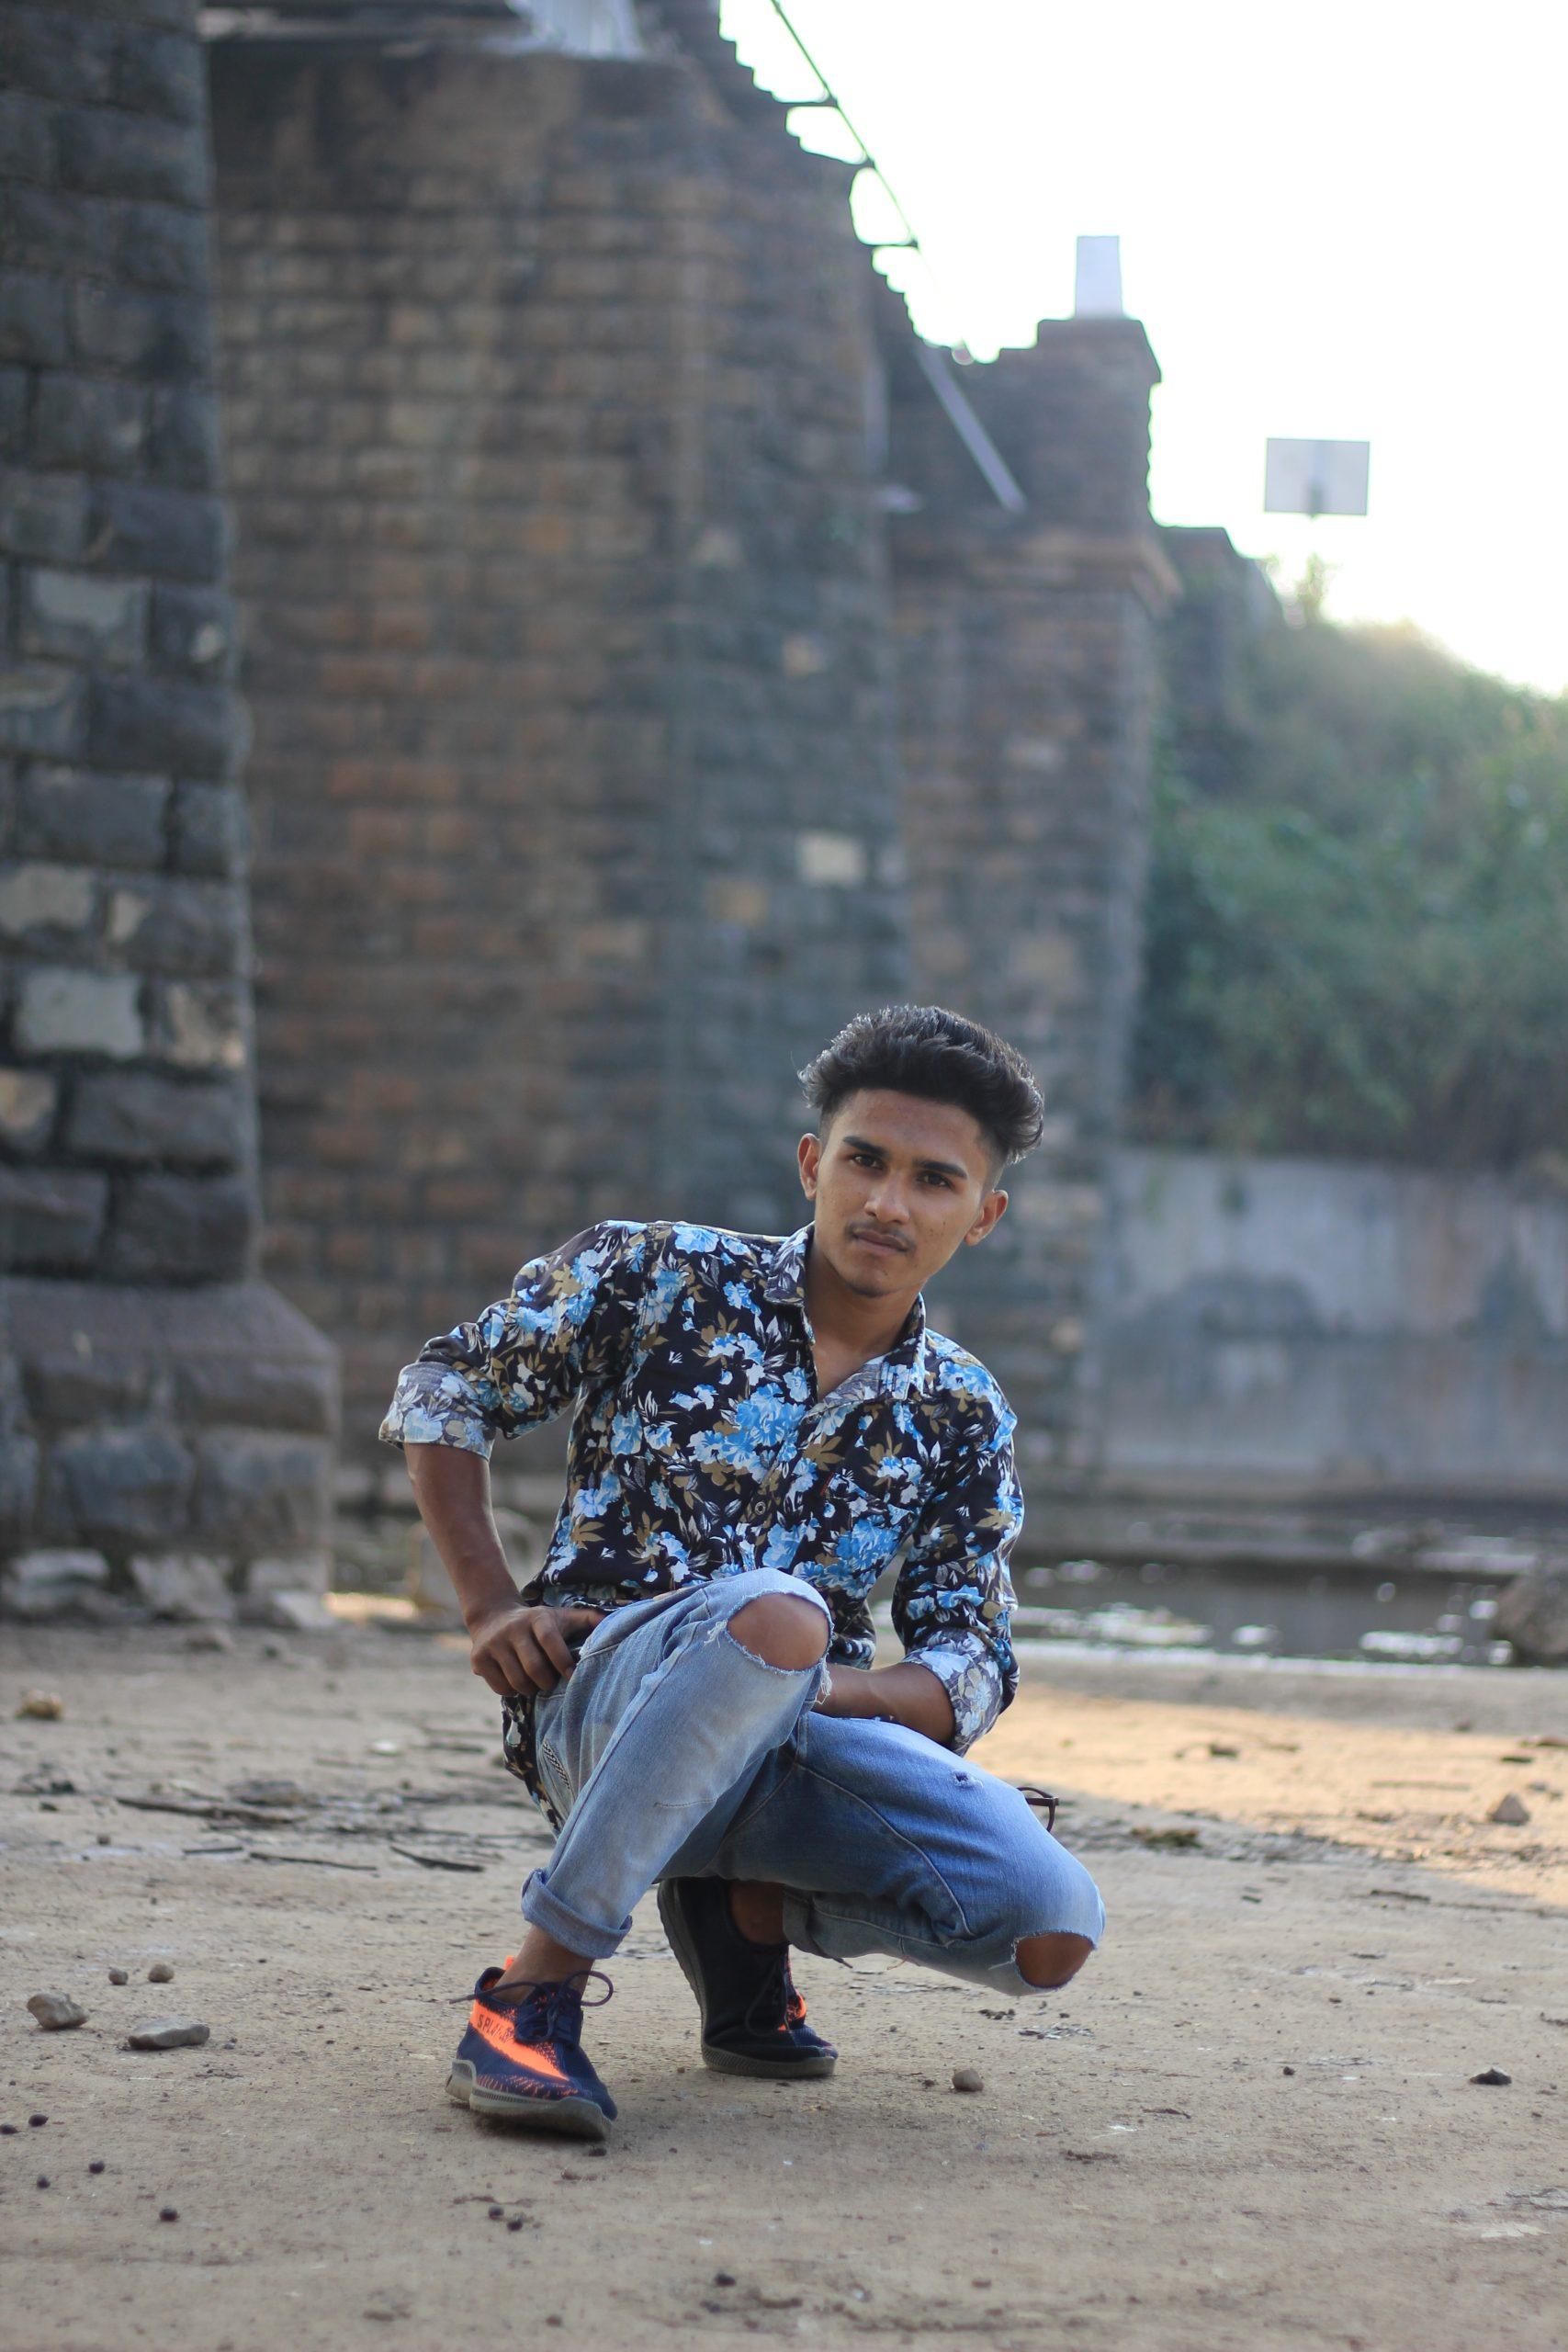 Boy sitting on a ground